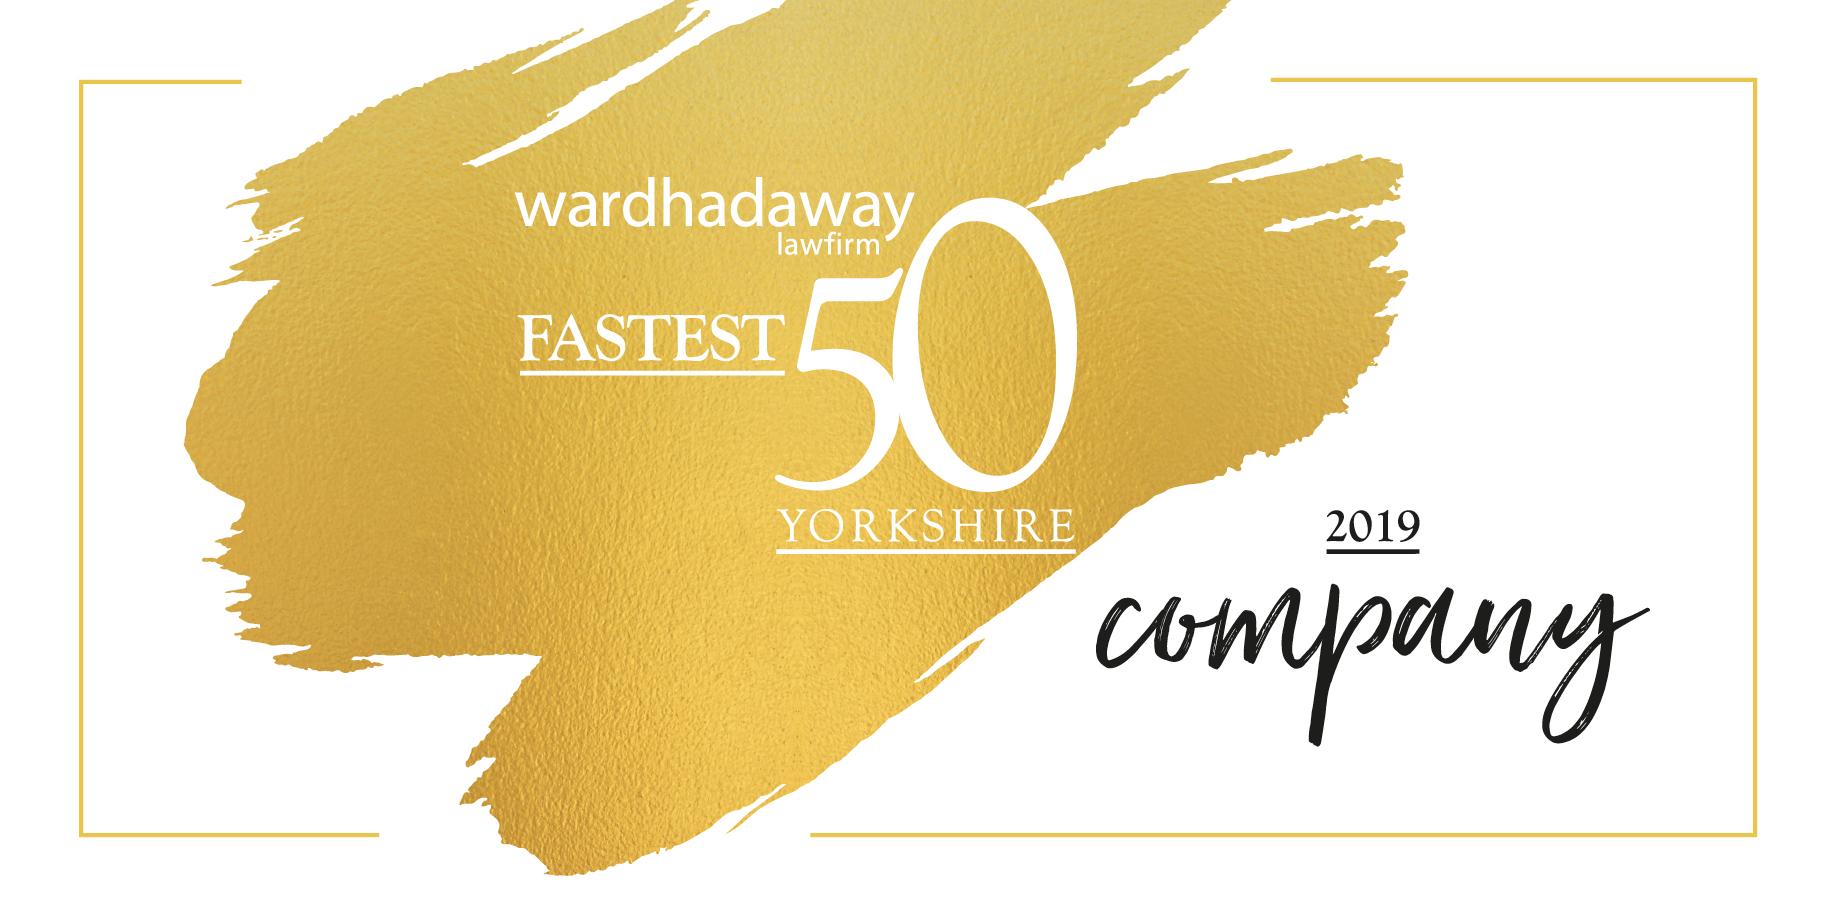 Ward Hadaway fastest 50 growing companies in Yorkshire